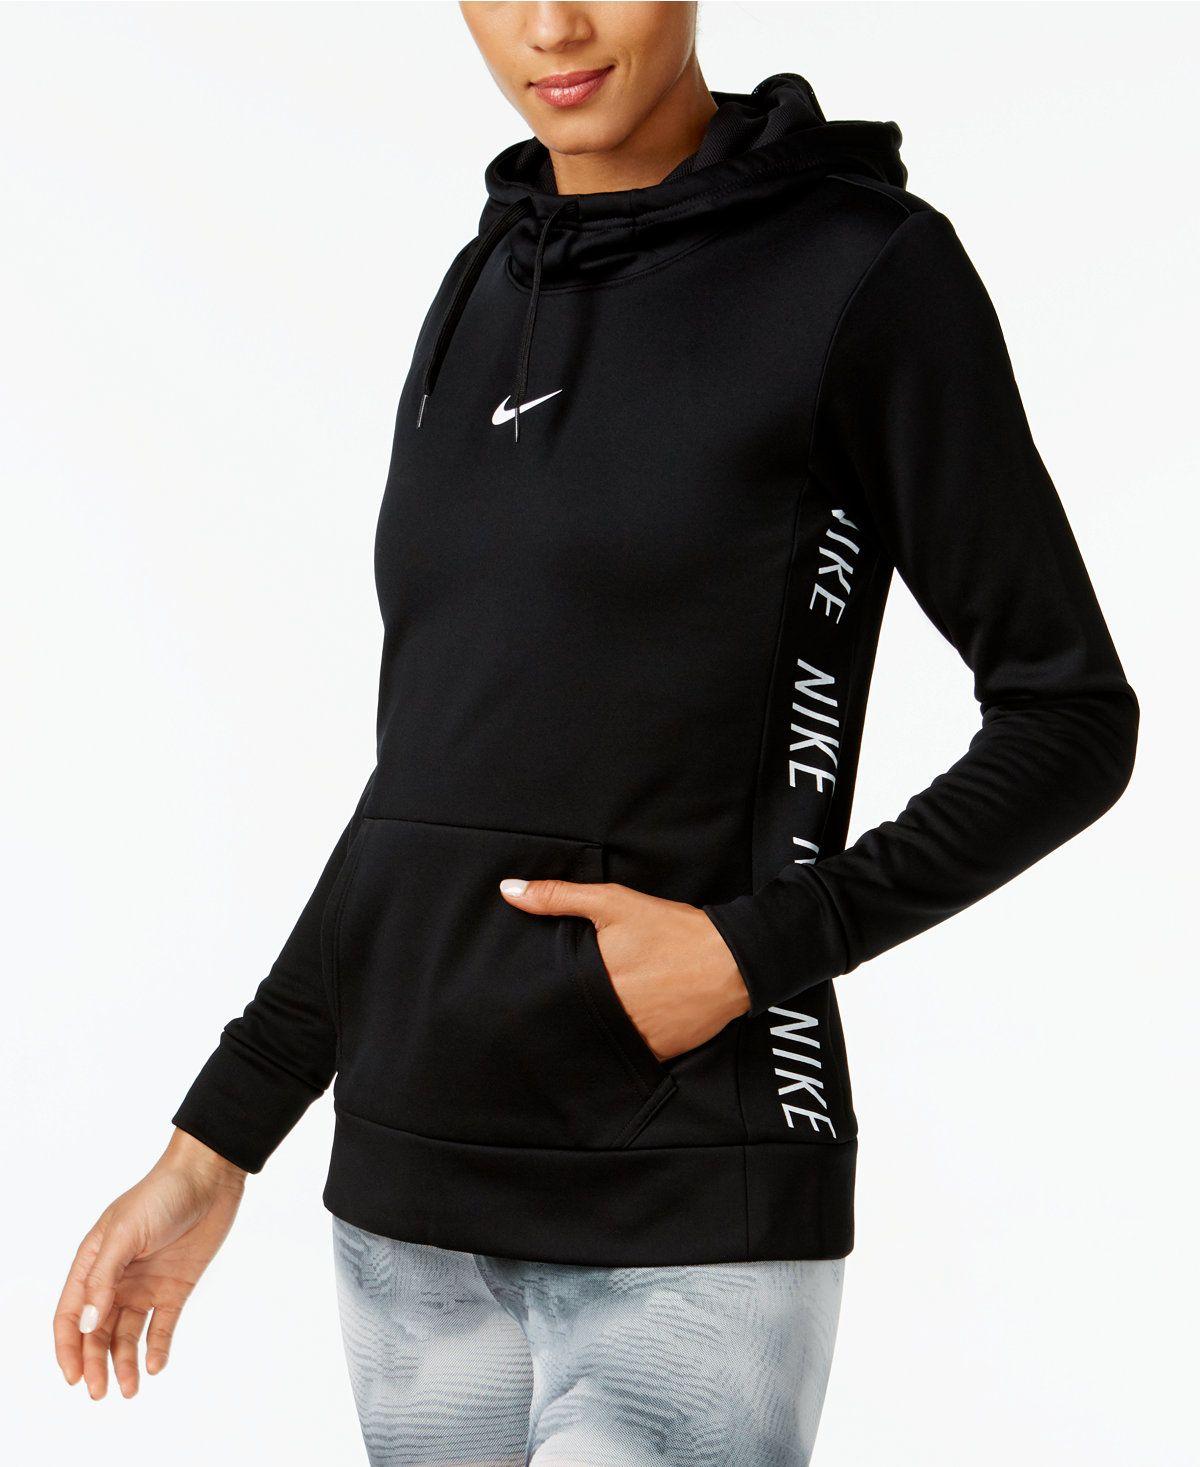 f334841e8140 Nike Therma Training Hoodie - Tops - Women - Macy s